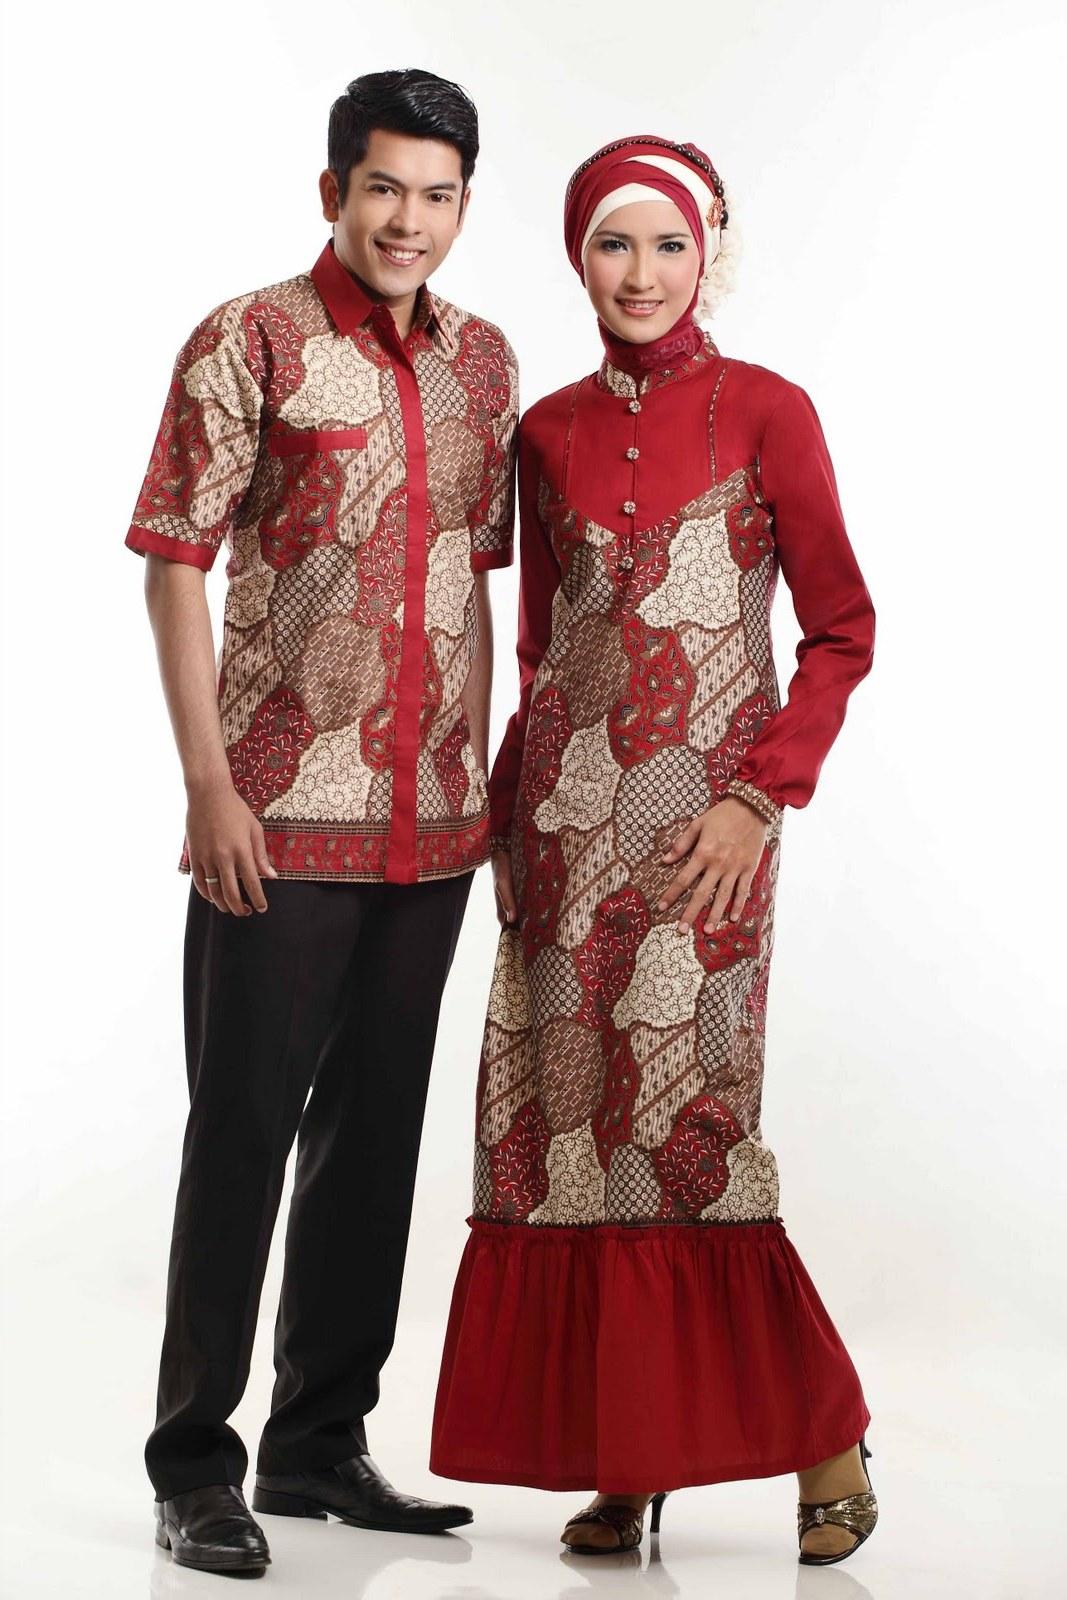 Ide Lihat Baju Lebaran Bqdd Bintang anda Trend Model Baju Batik Lebaran Terbaru 2013